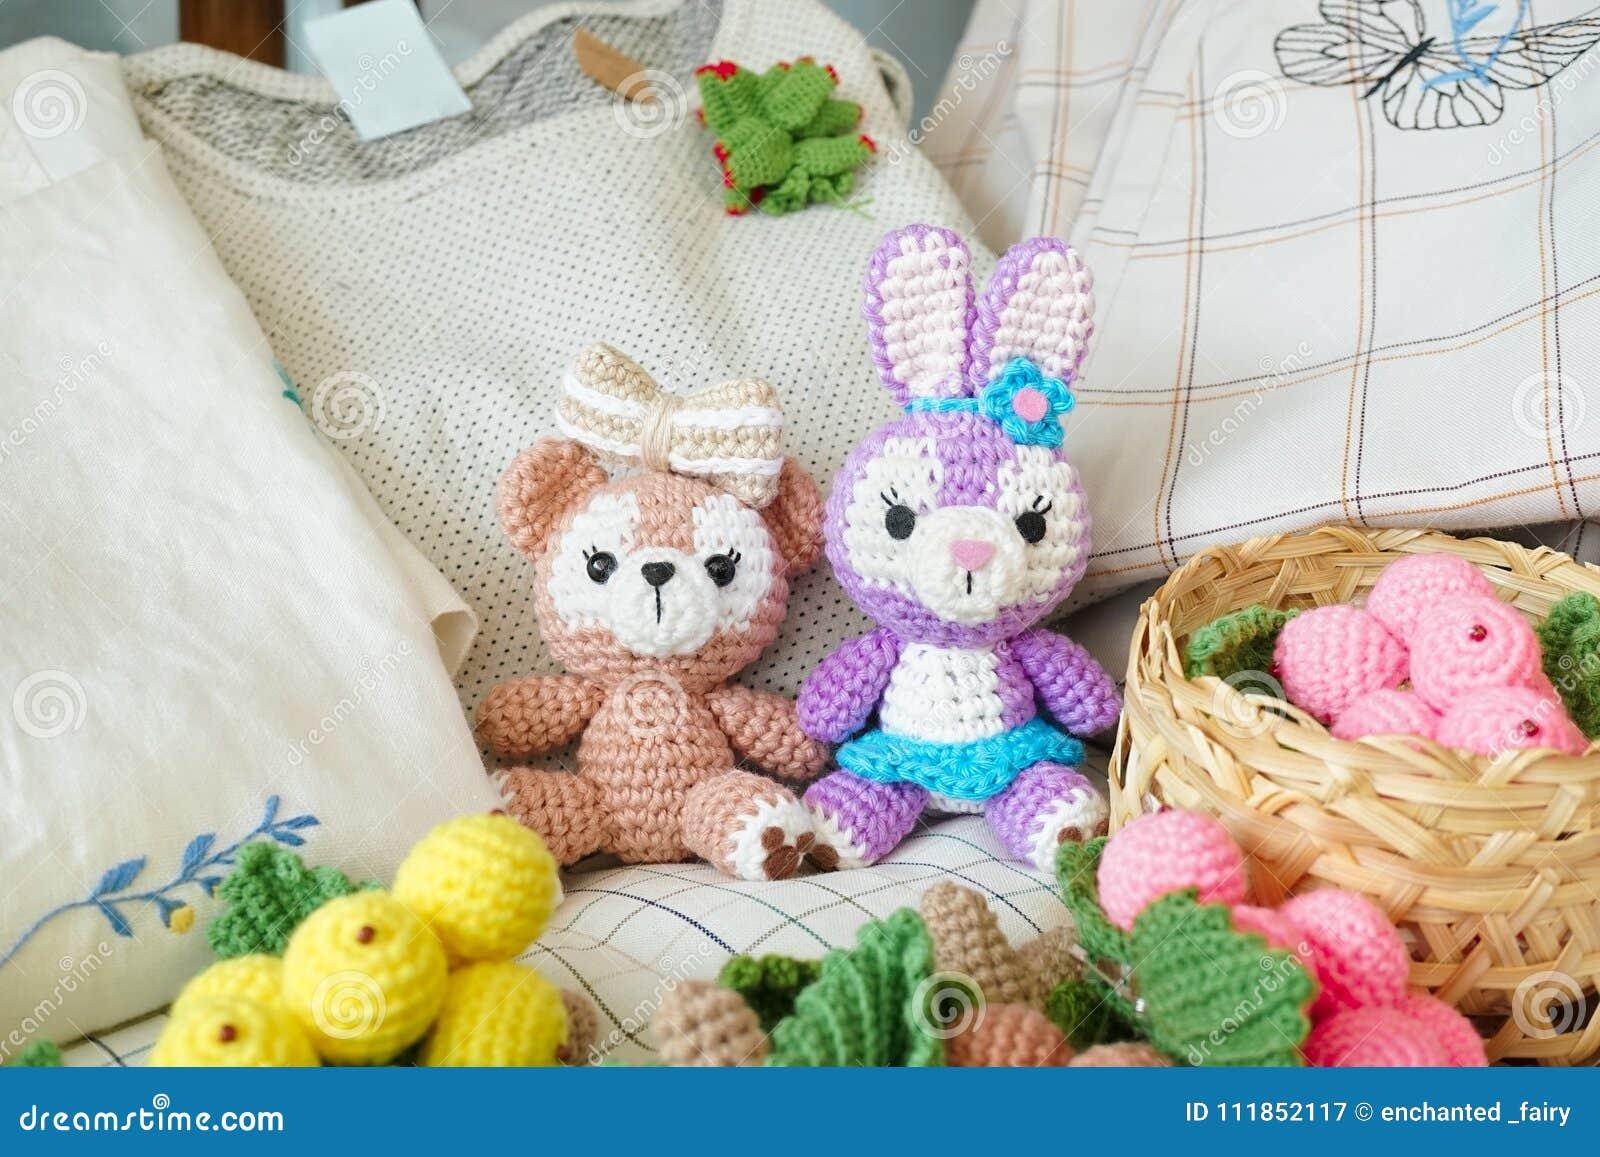 Häkelarbeitpuppen ein netter Teddybär und ein Osterhase amigurumi Puppe